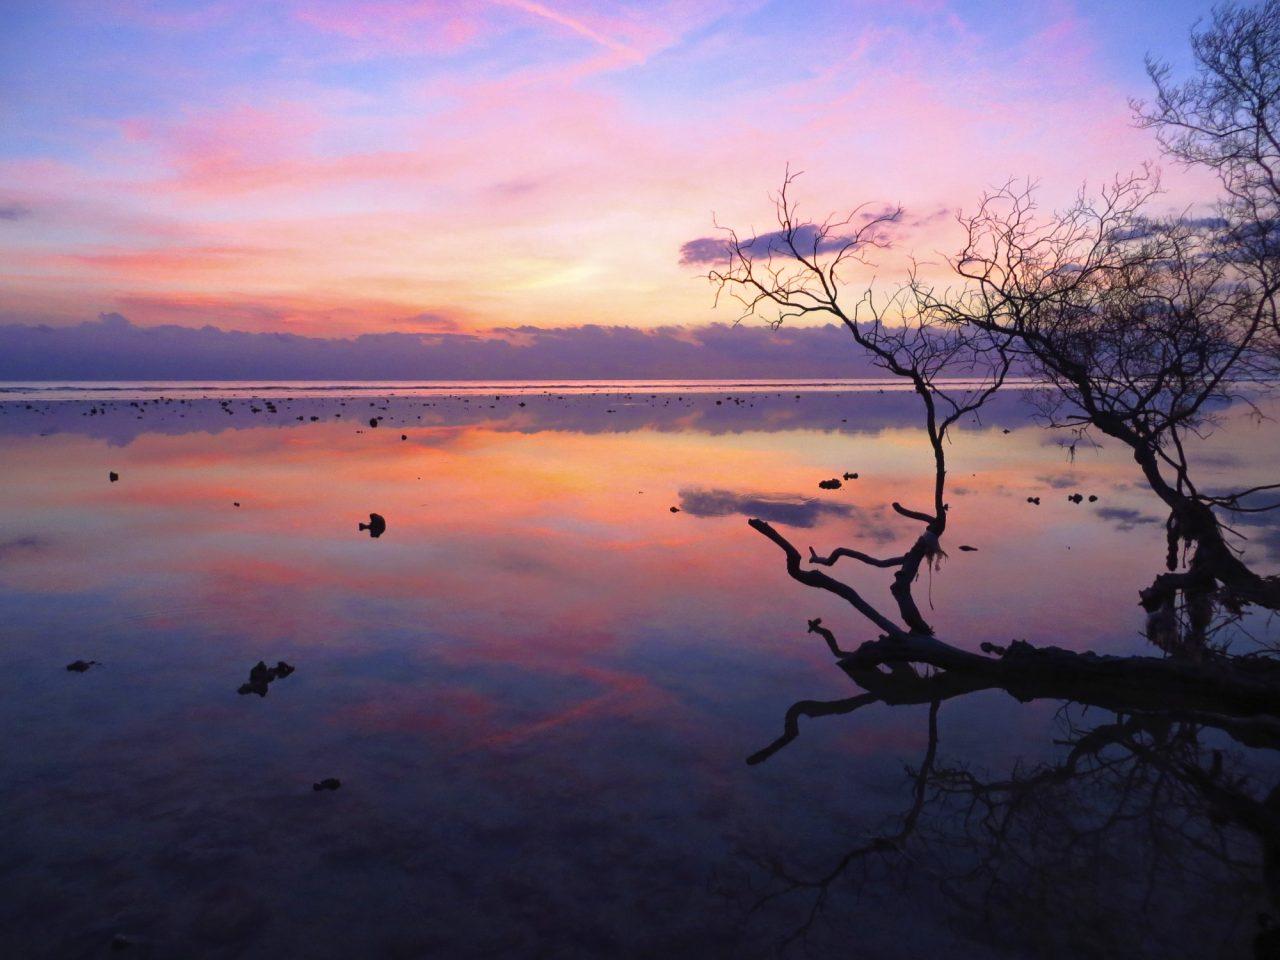 Gilli Islands. Foto: Vanessa M.